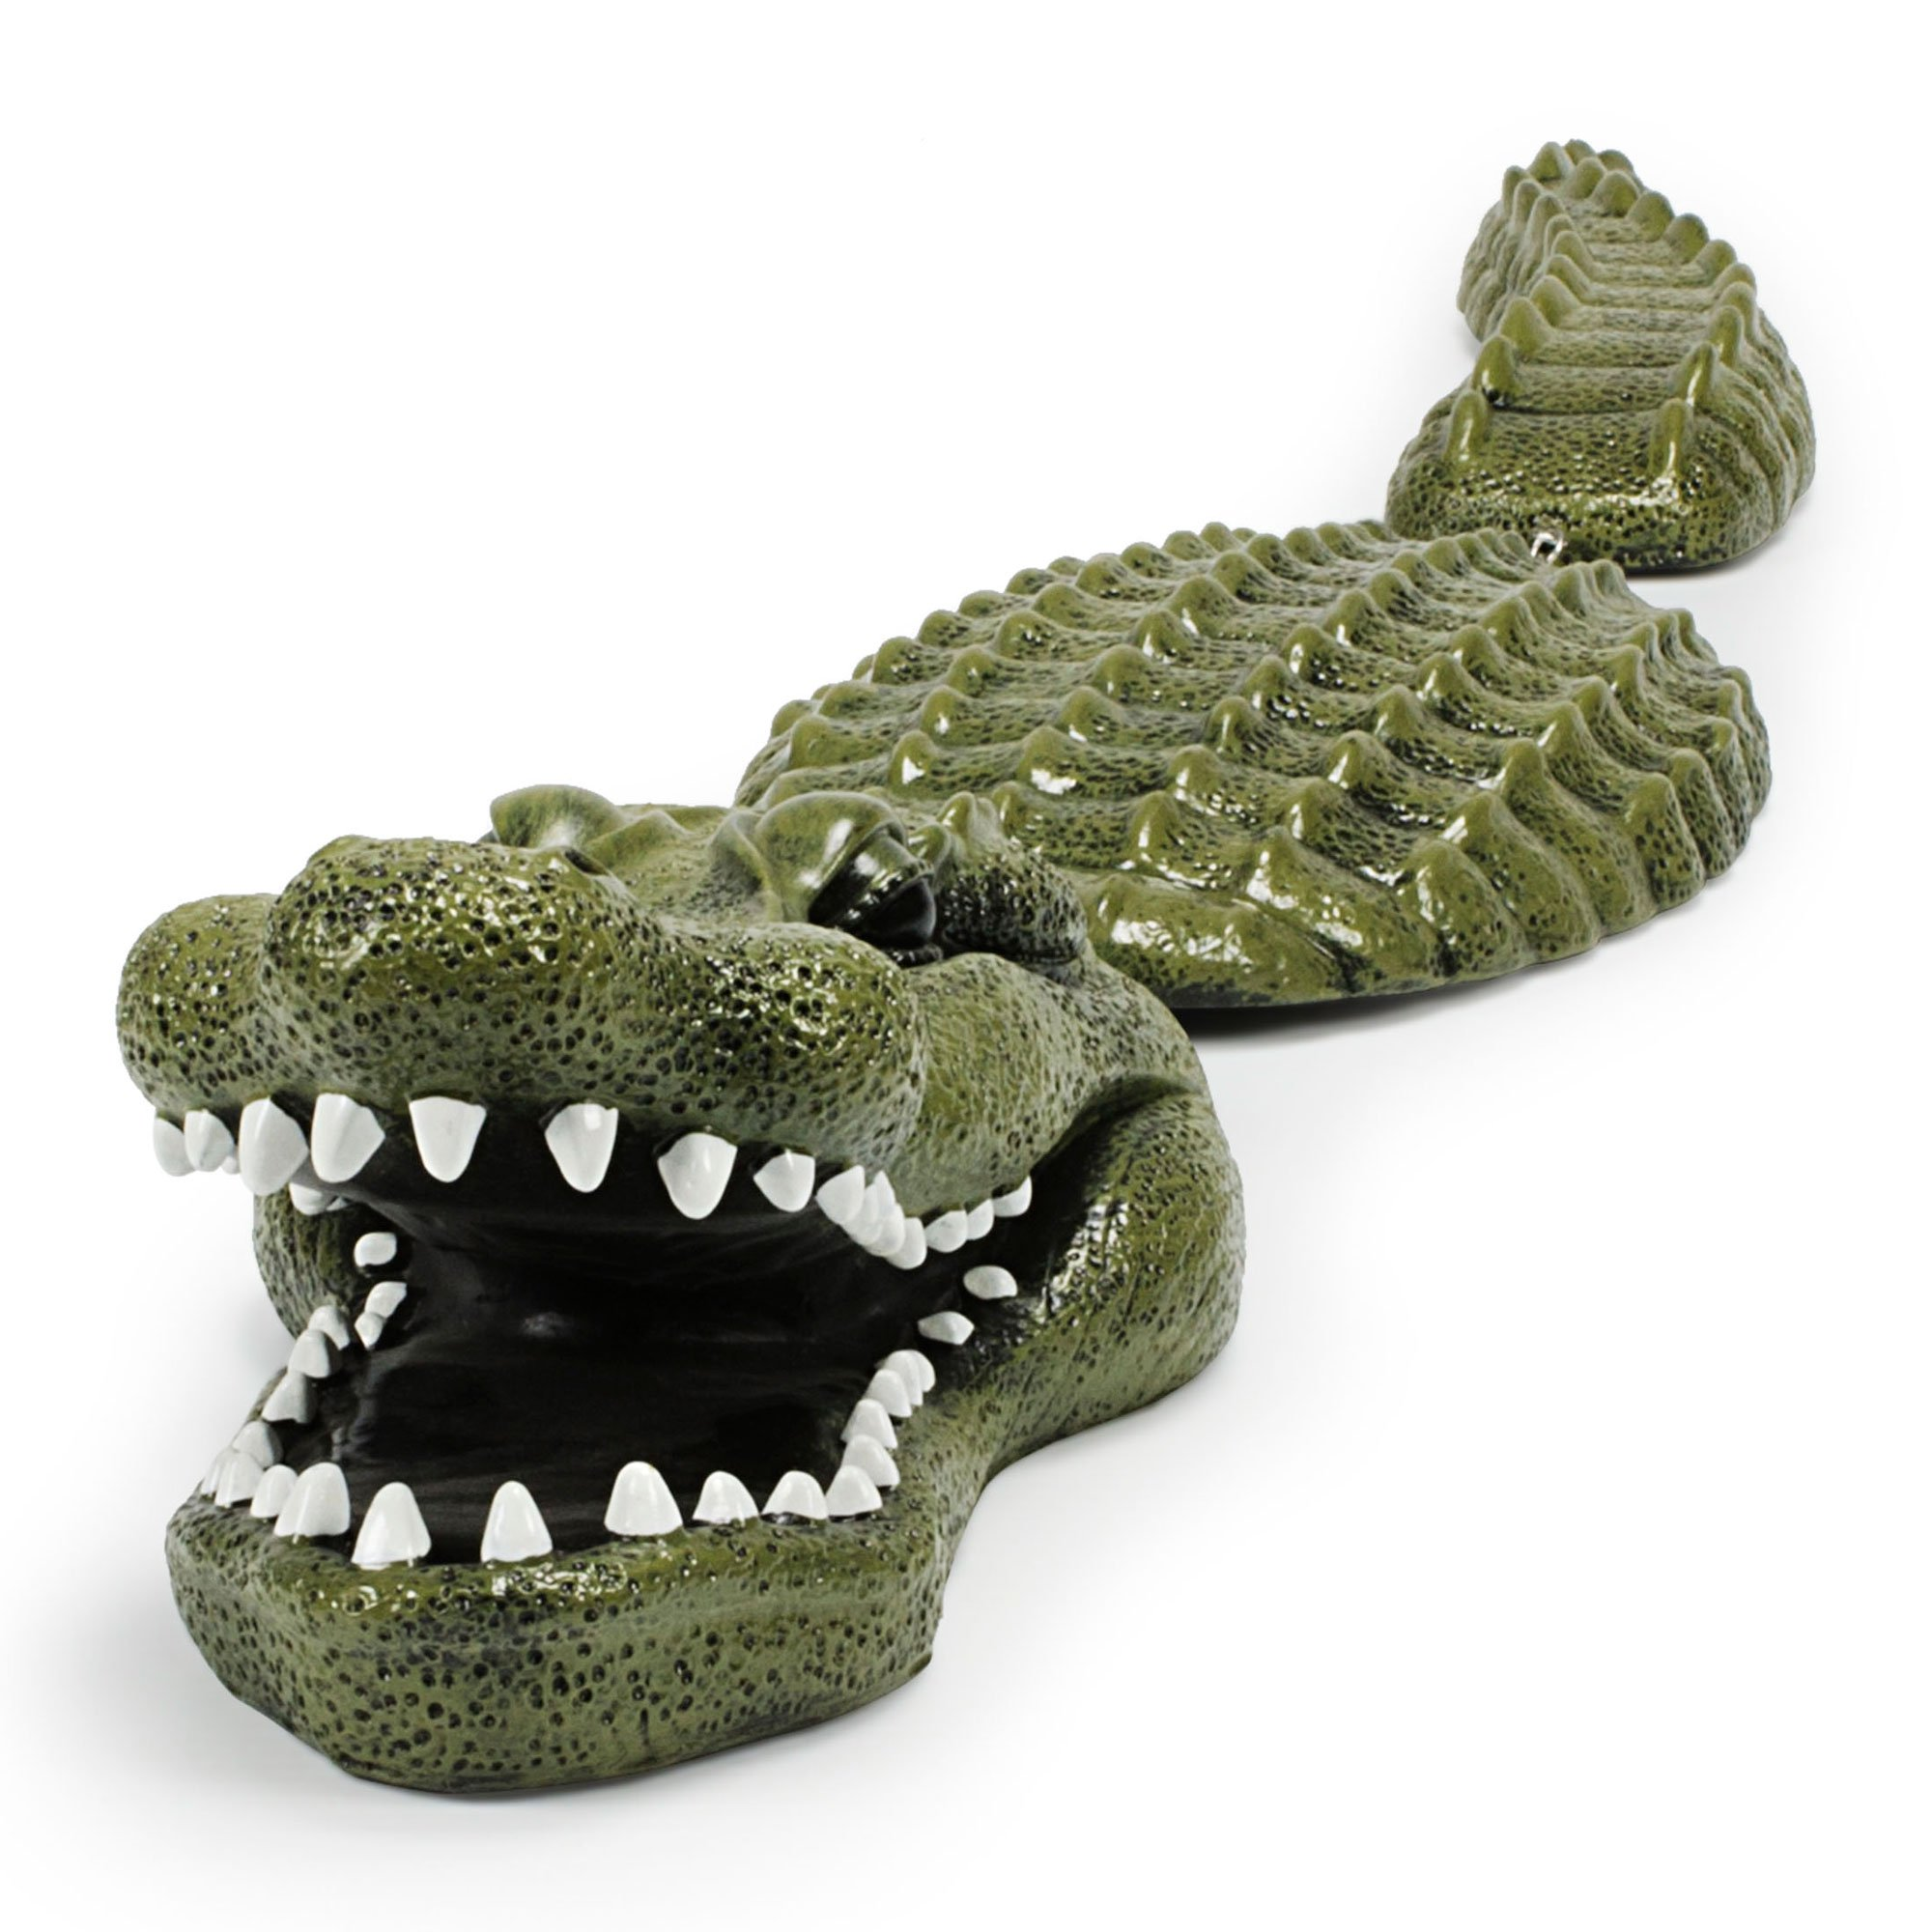 Aquascape Koi Fish Pond Floating Crocodile Alligator Predator Decoy (2 Pack) - image 2 de 6